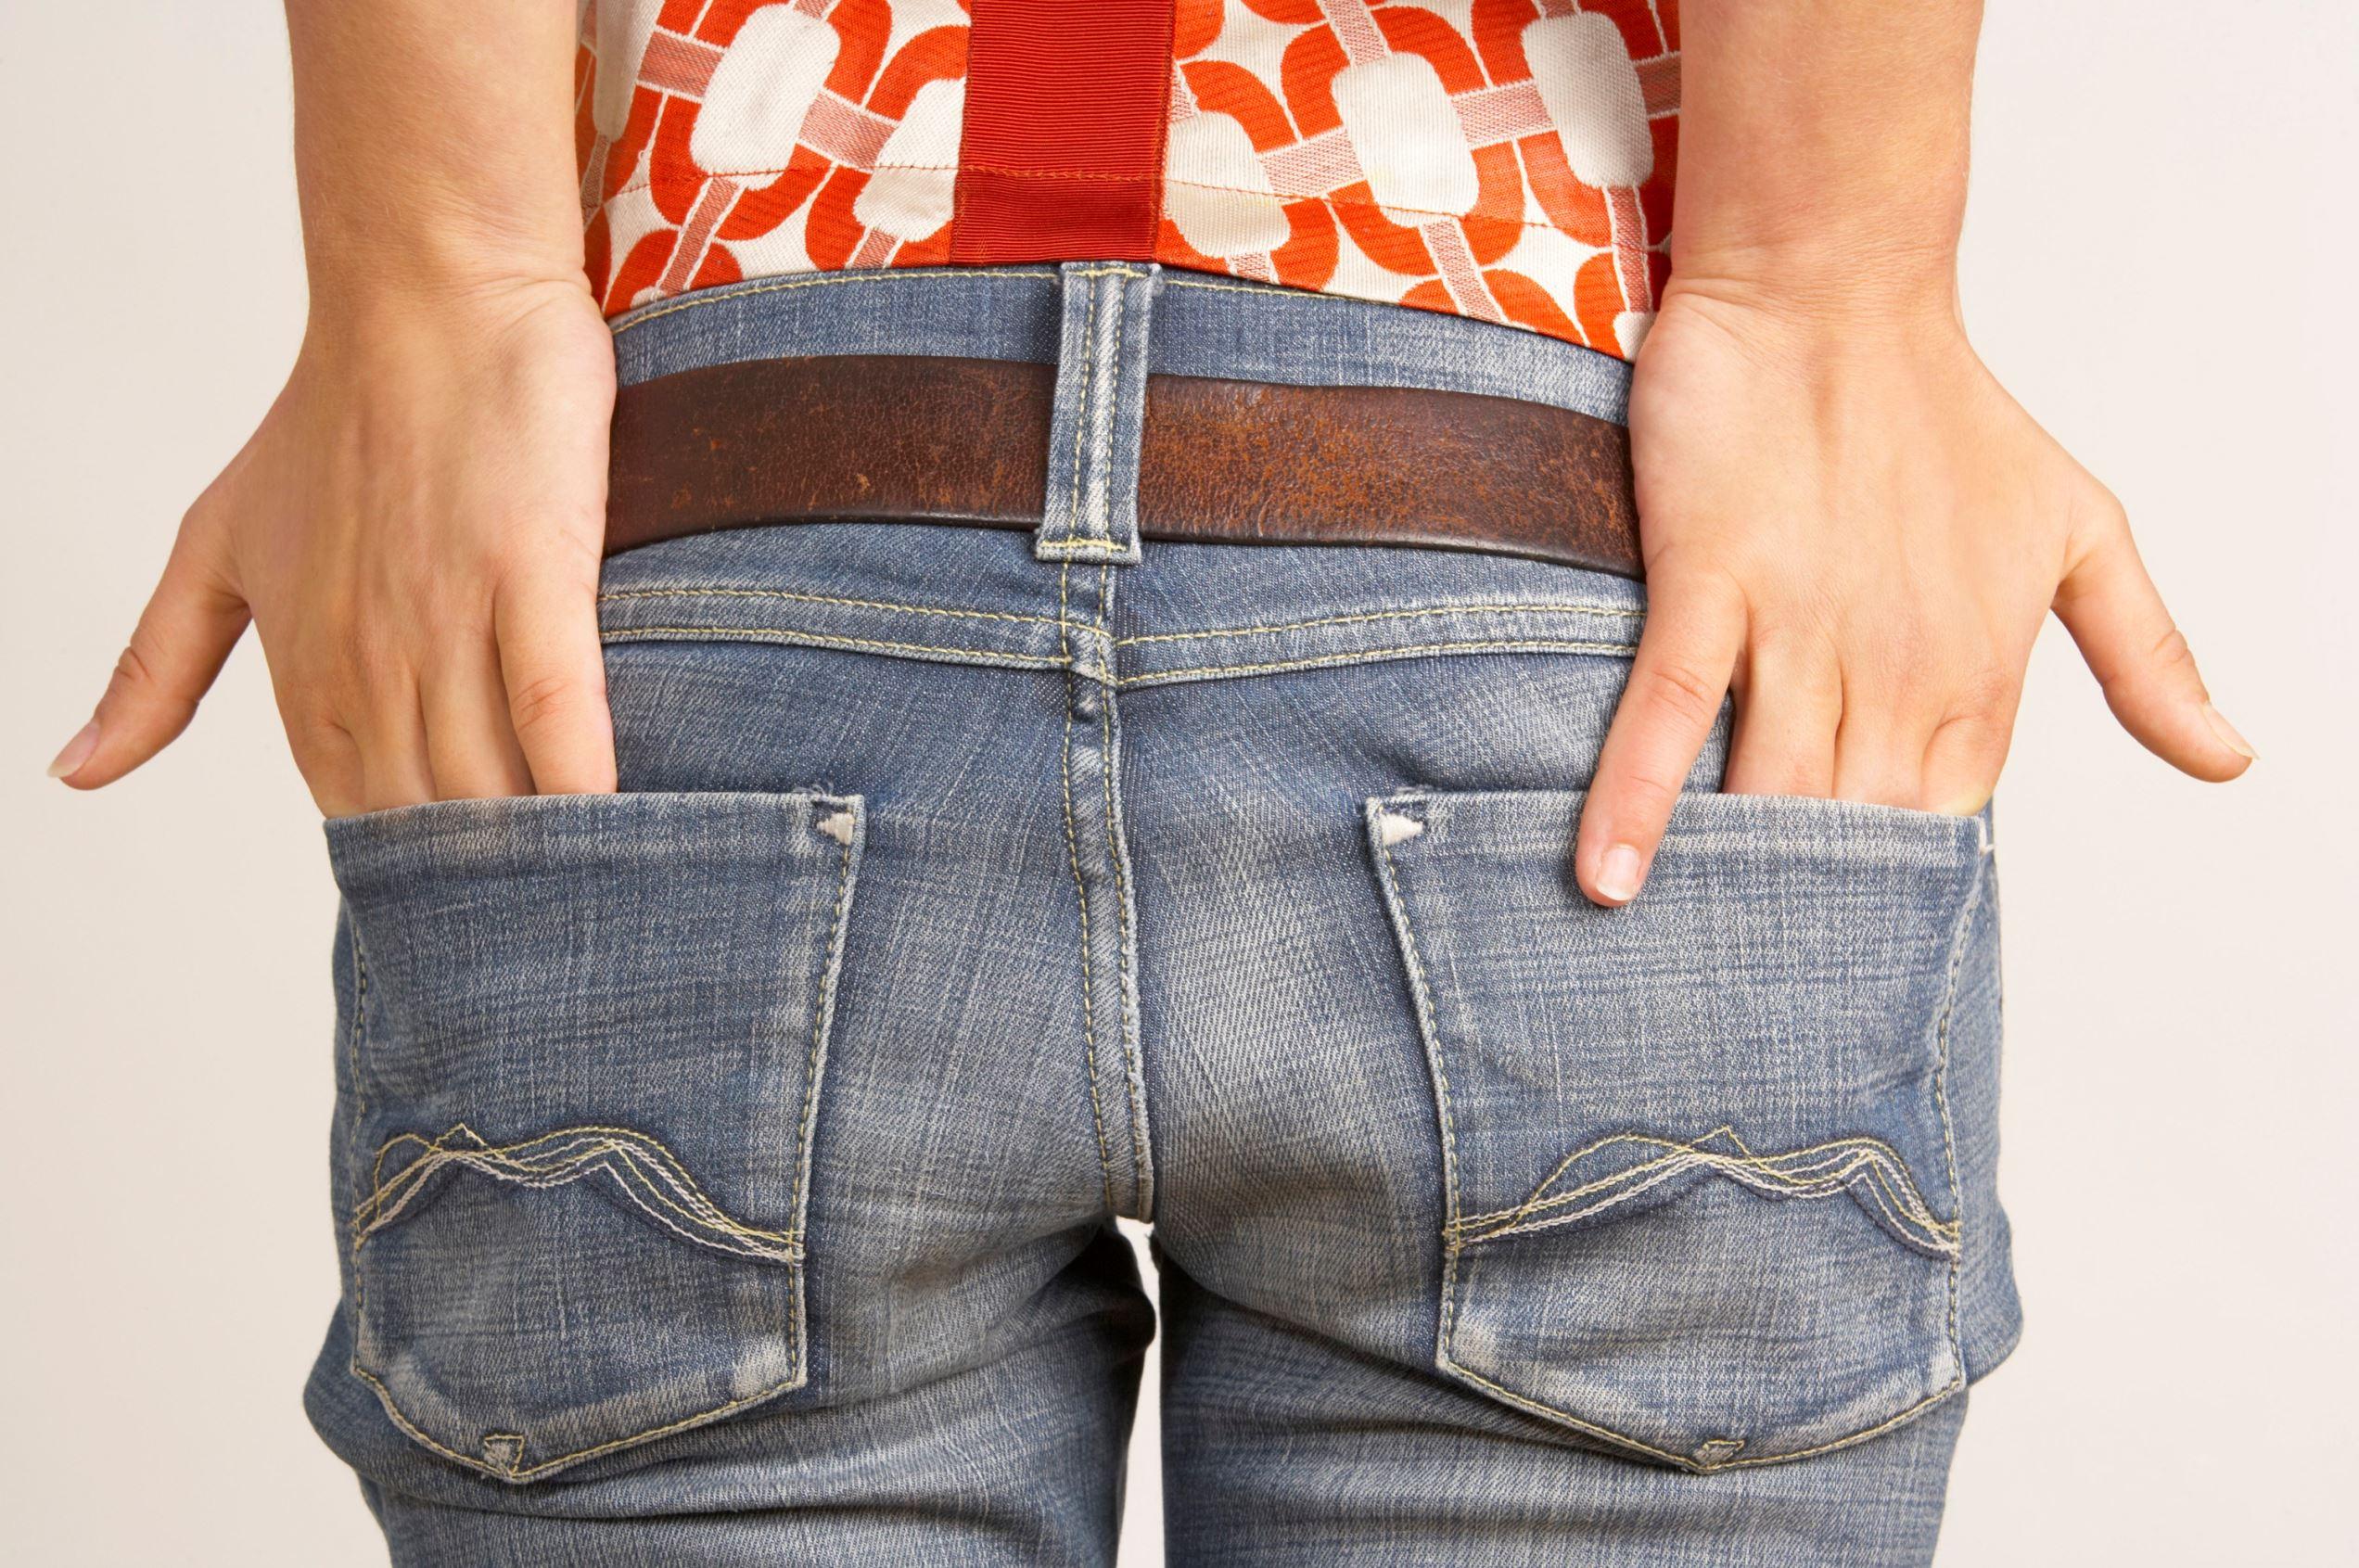 pimples on buttocks crack rash